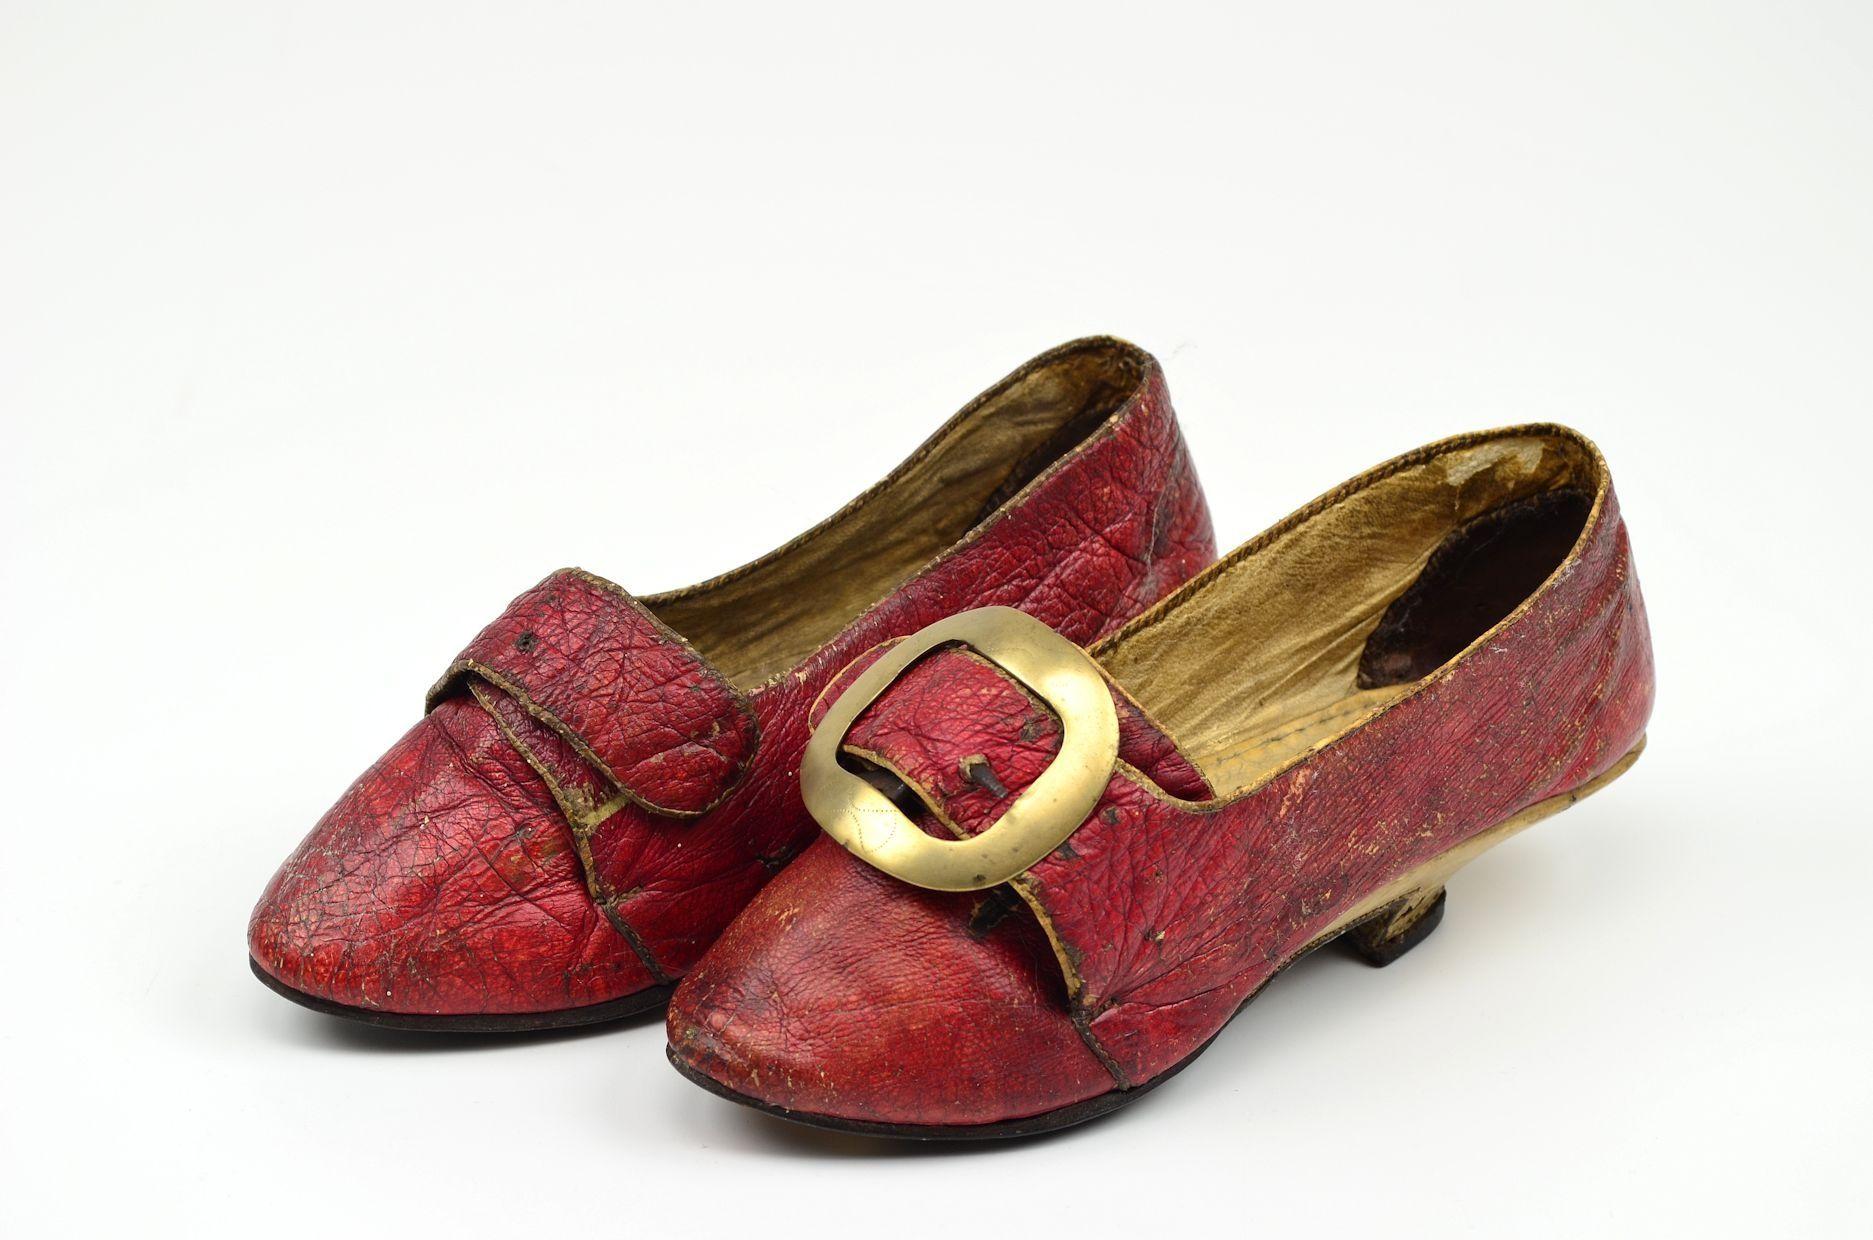 Pair of women s shoes 40dca09152